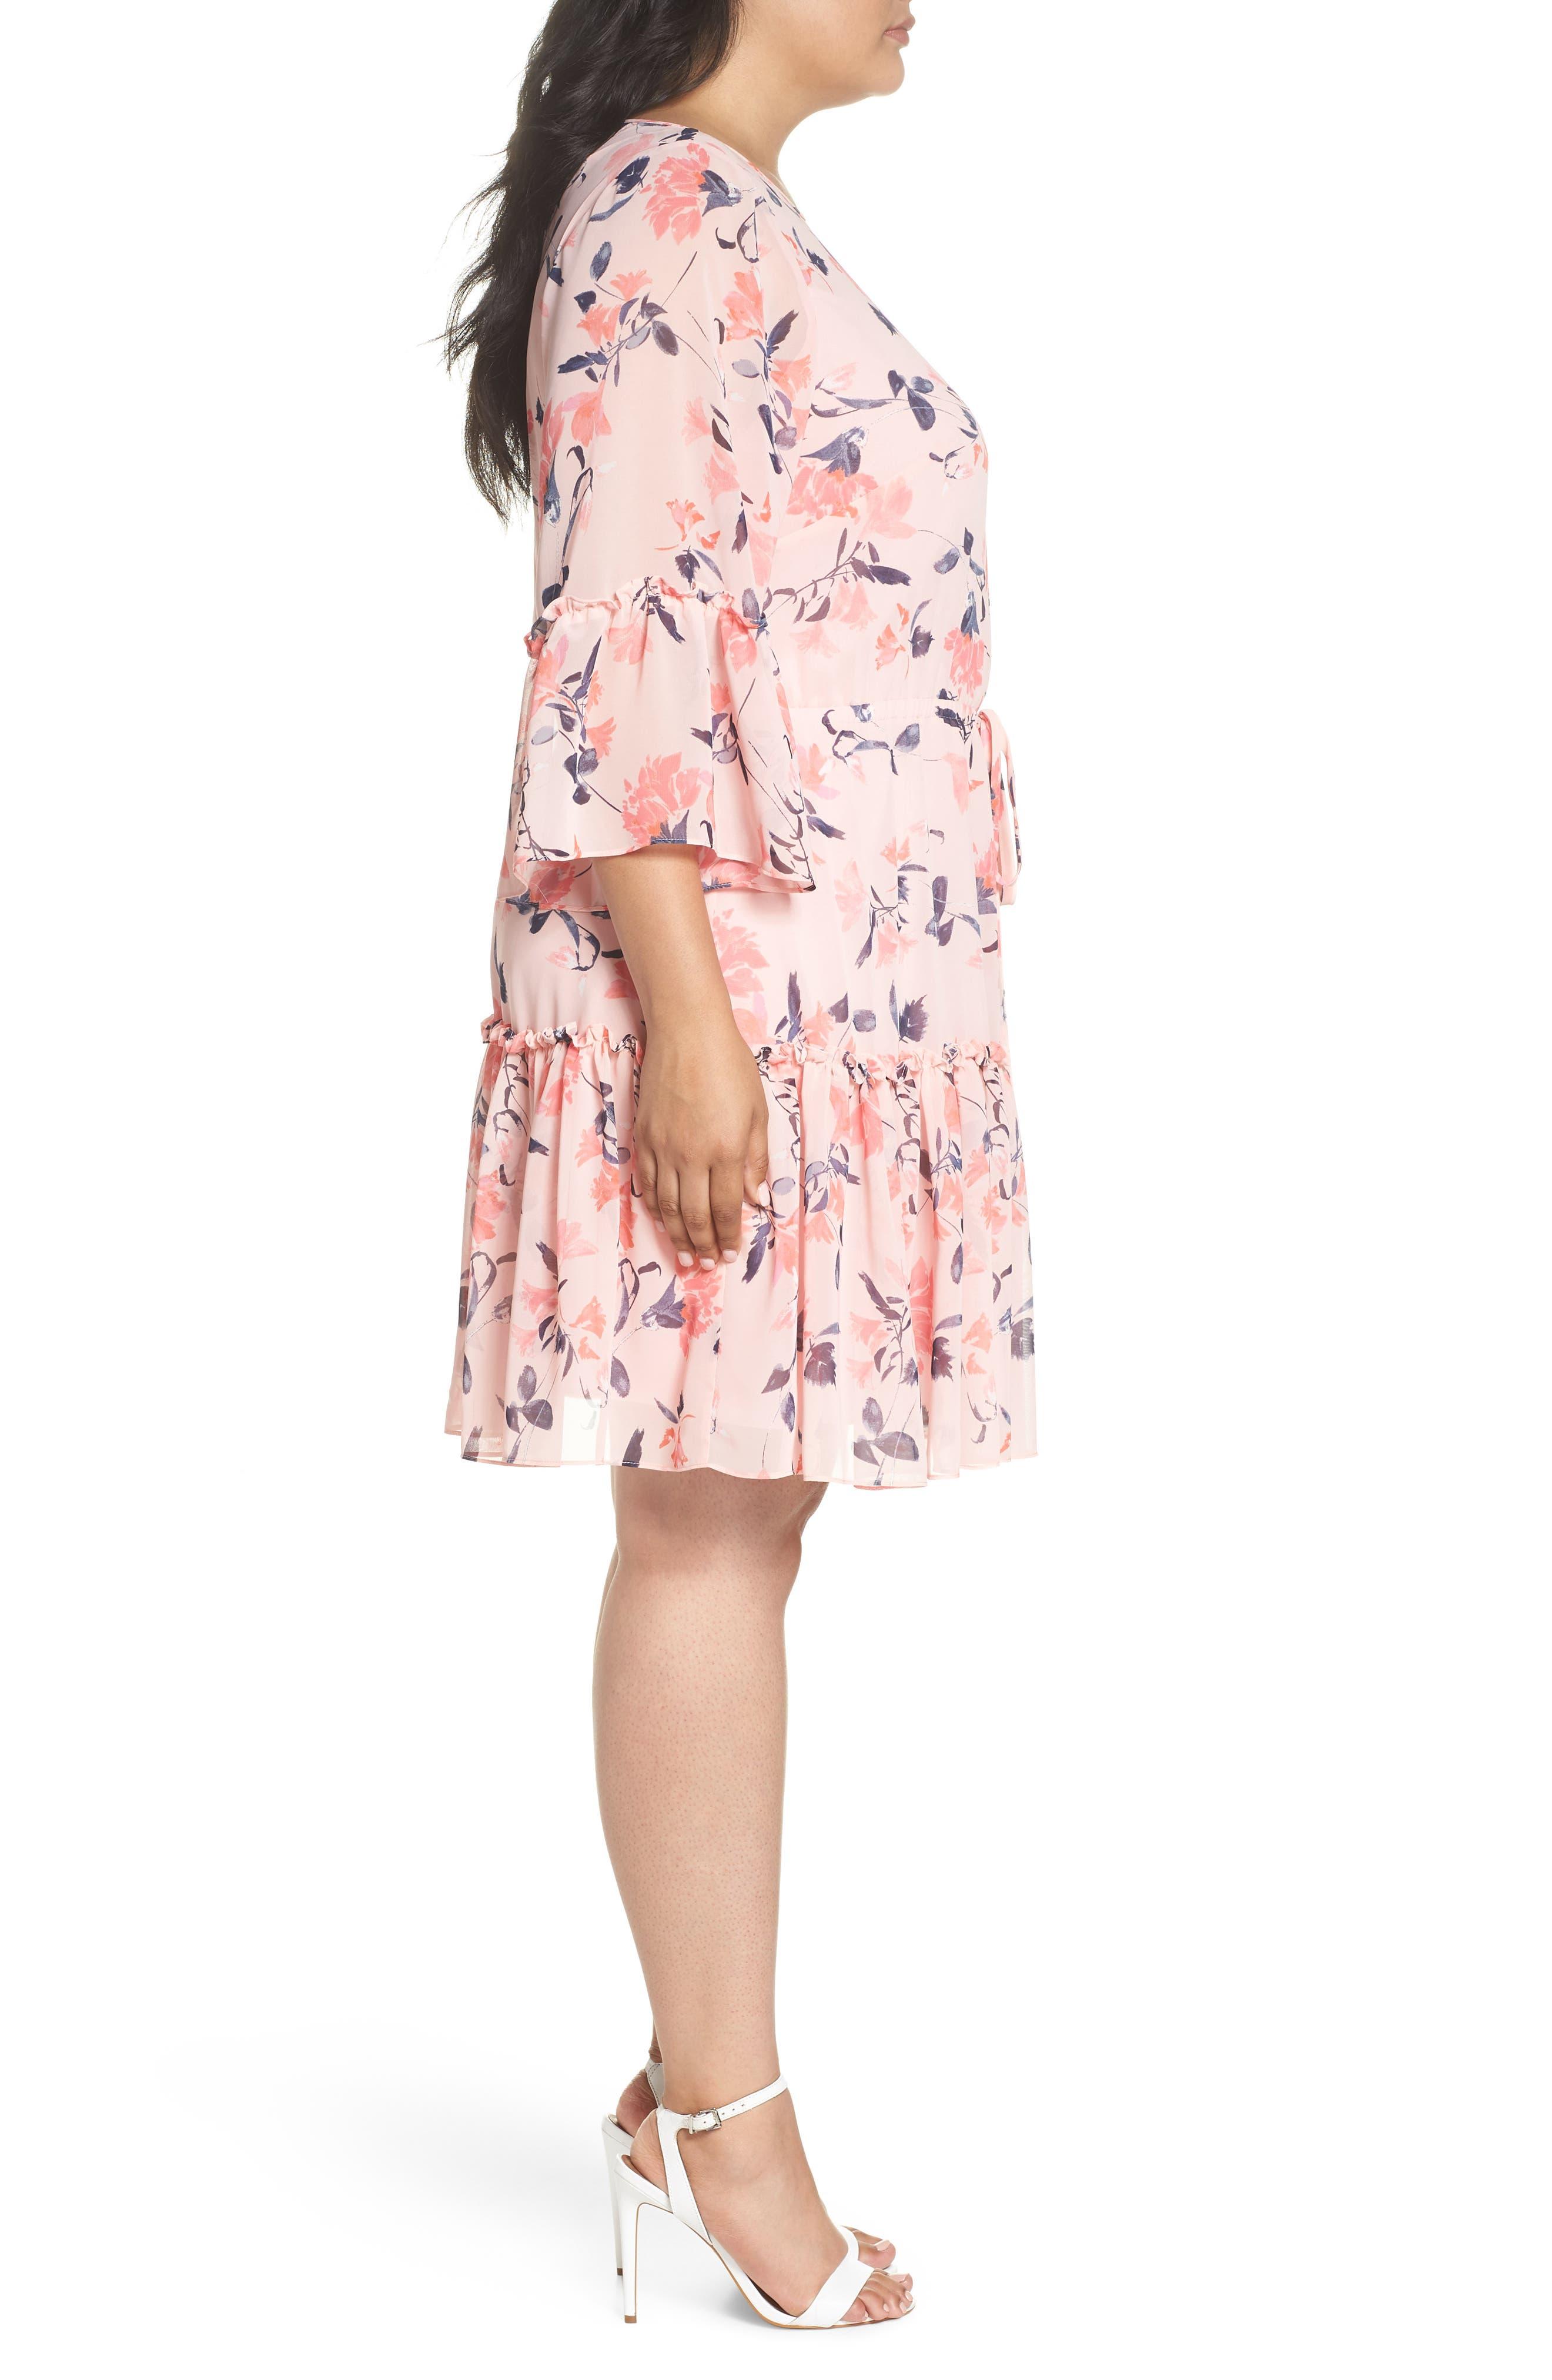 Elza J Floral Bell Sleeve Chiffon Dress,                             Alternate thumbnail 3, color,                             Blush